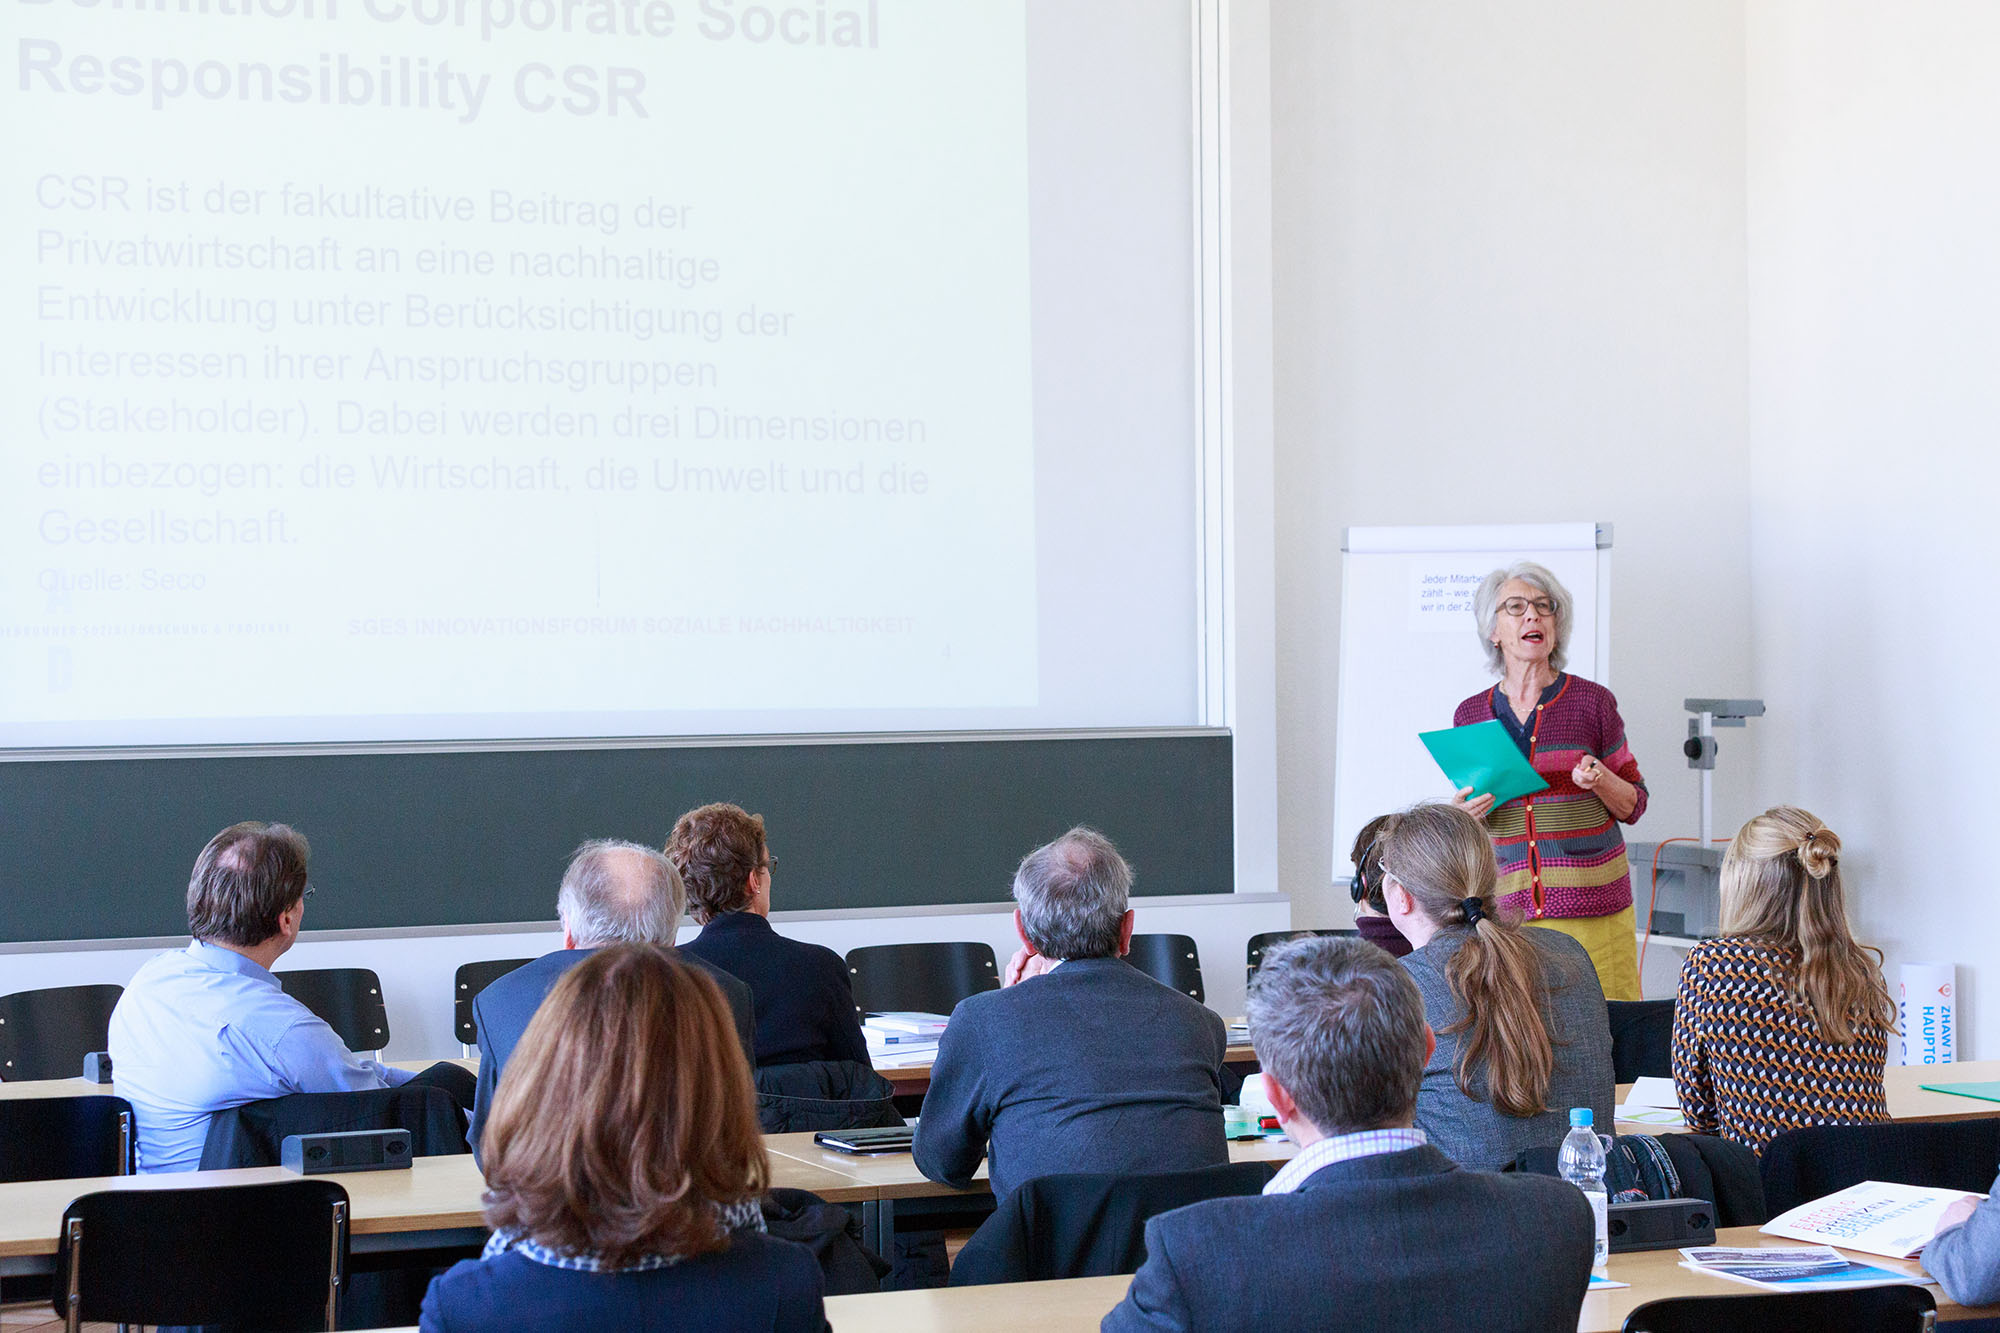 Dr. Annelies Debrunner, Firmeninhaberin Debrunner Sozialforschung